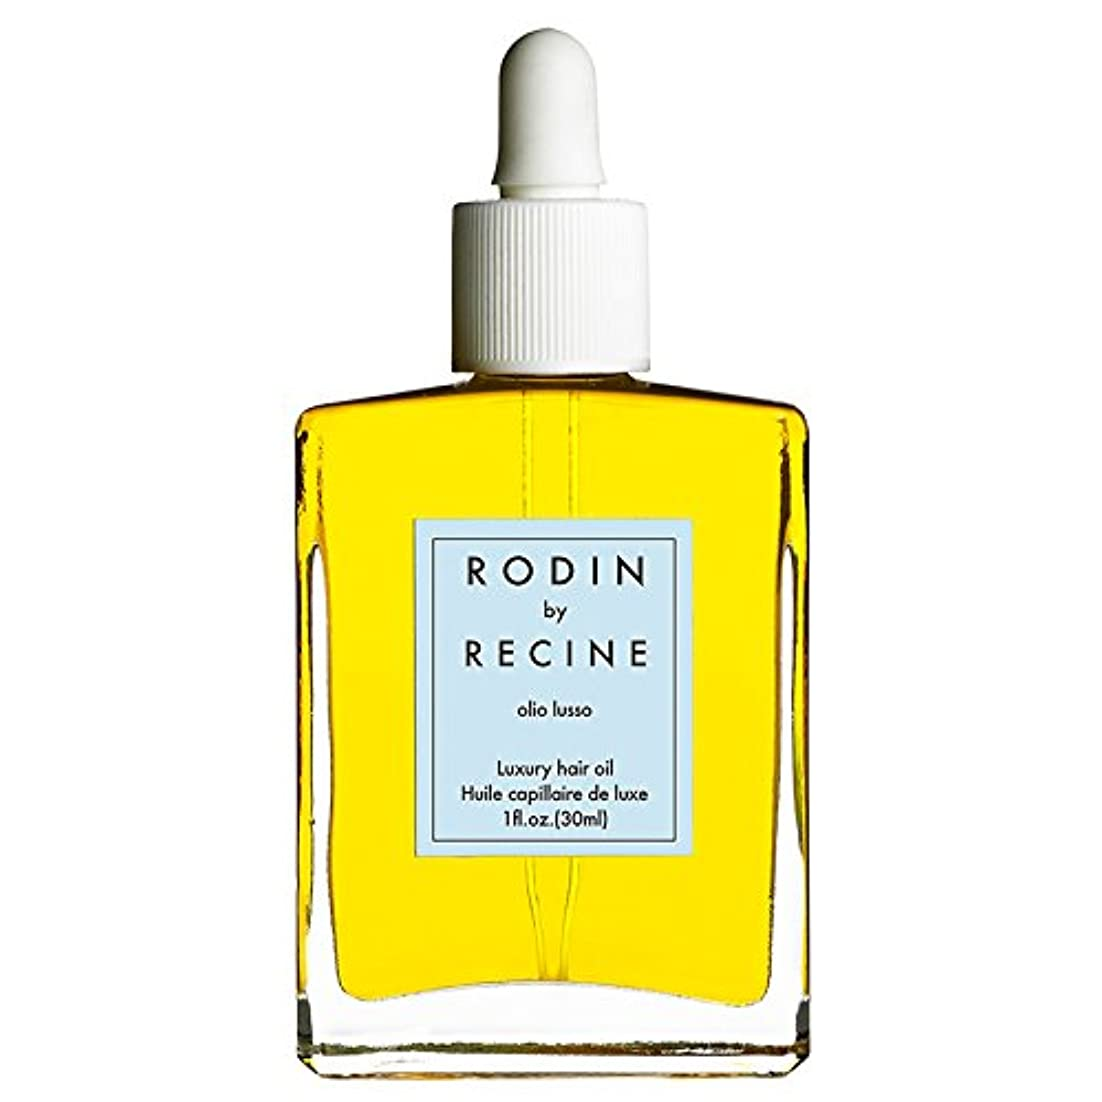 Rodin By Recine Luxury Hair Oil 1oz (30ml) by Rodin